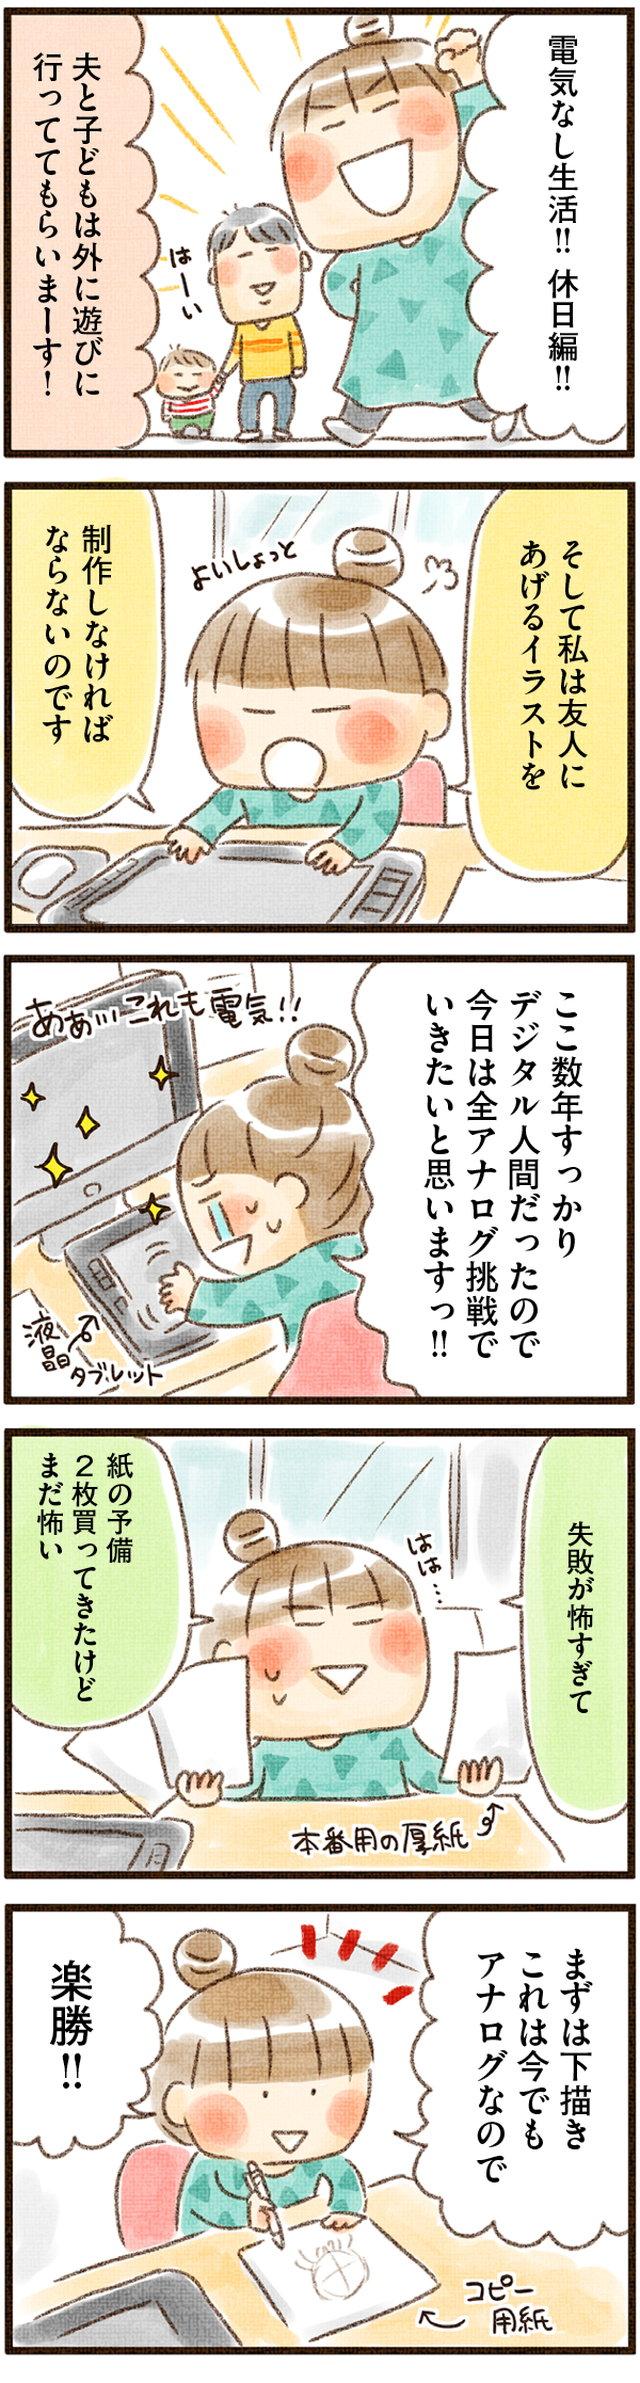 katano3_1.jpeg